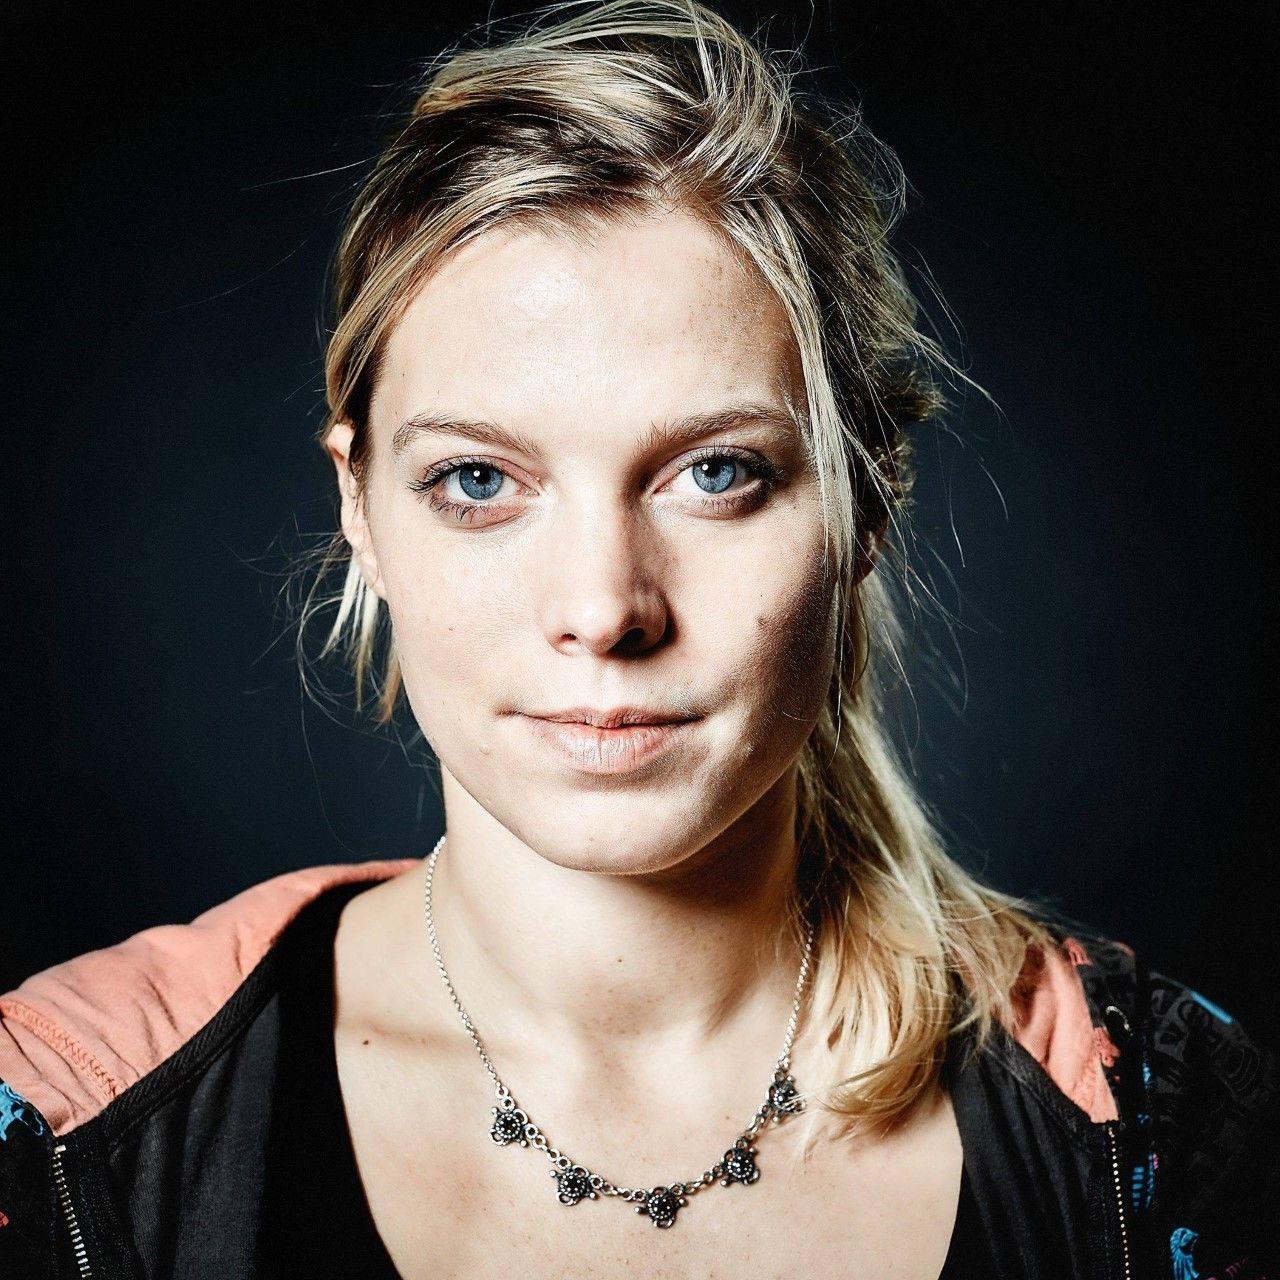 Saskia Gaulke